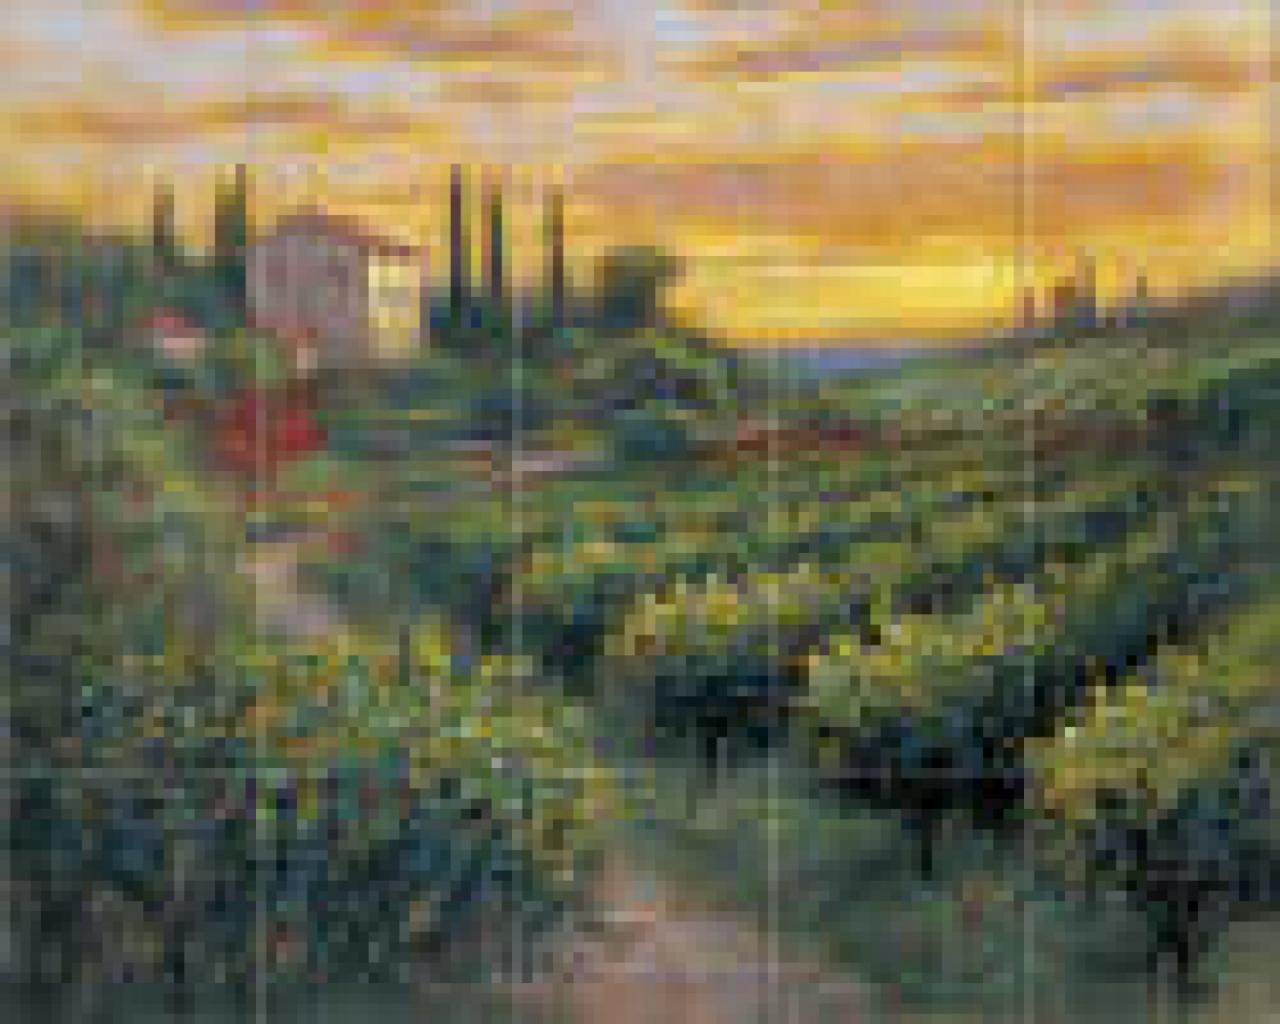 - Free Download Tuscan Tuscany Scenes Kitchen Backsplash Tile Murals